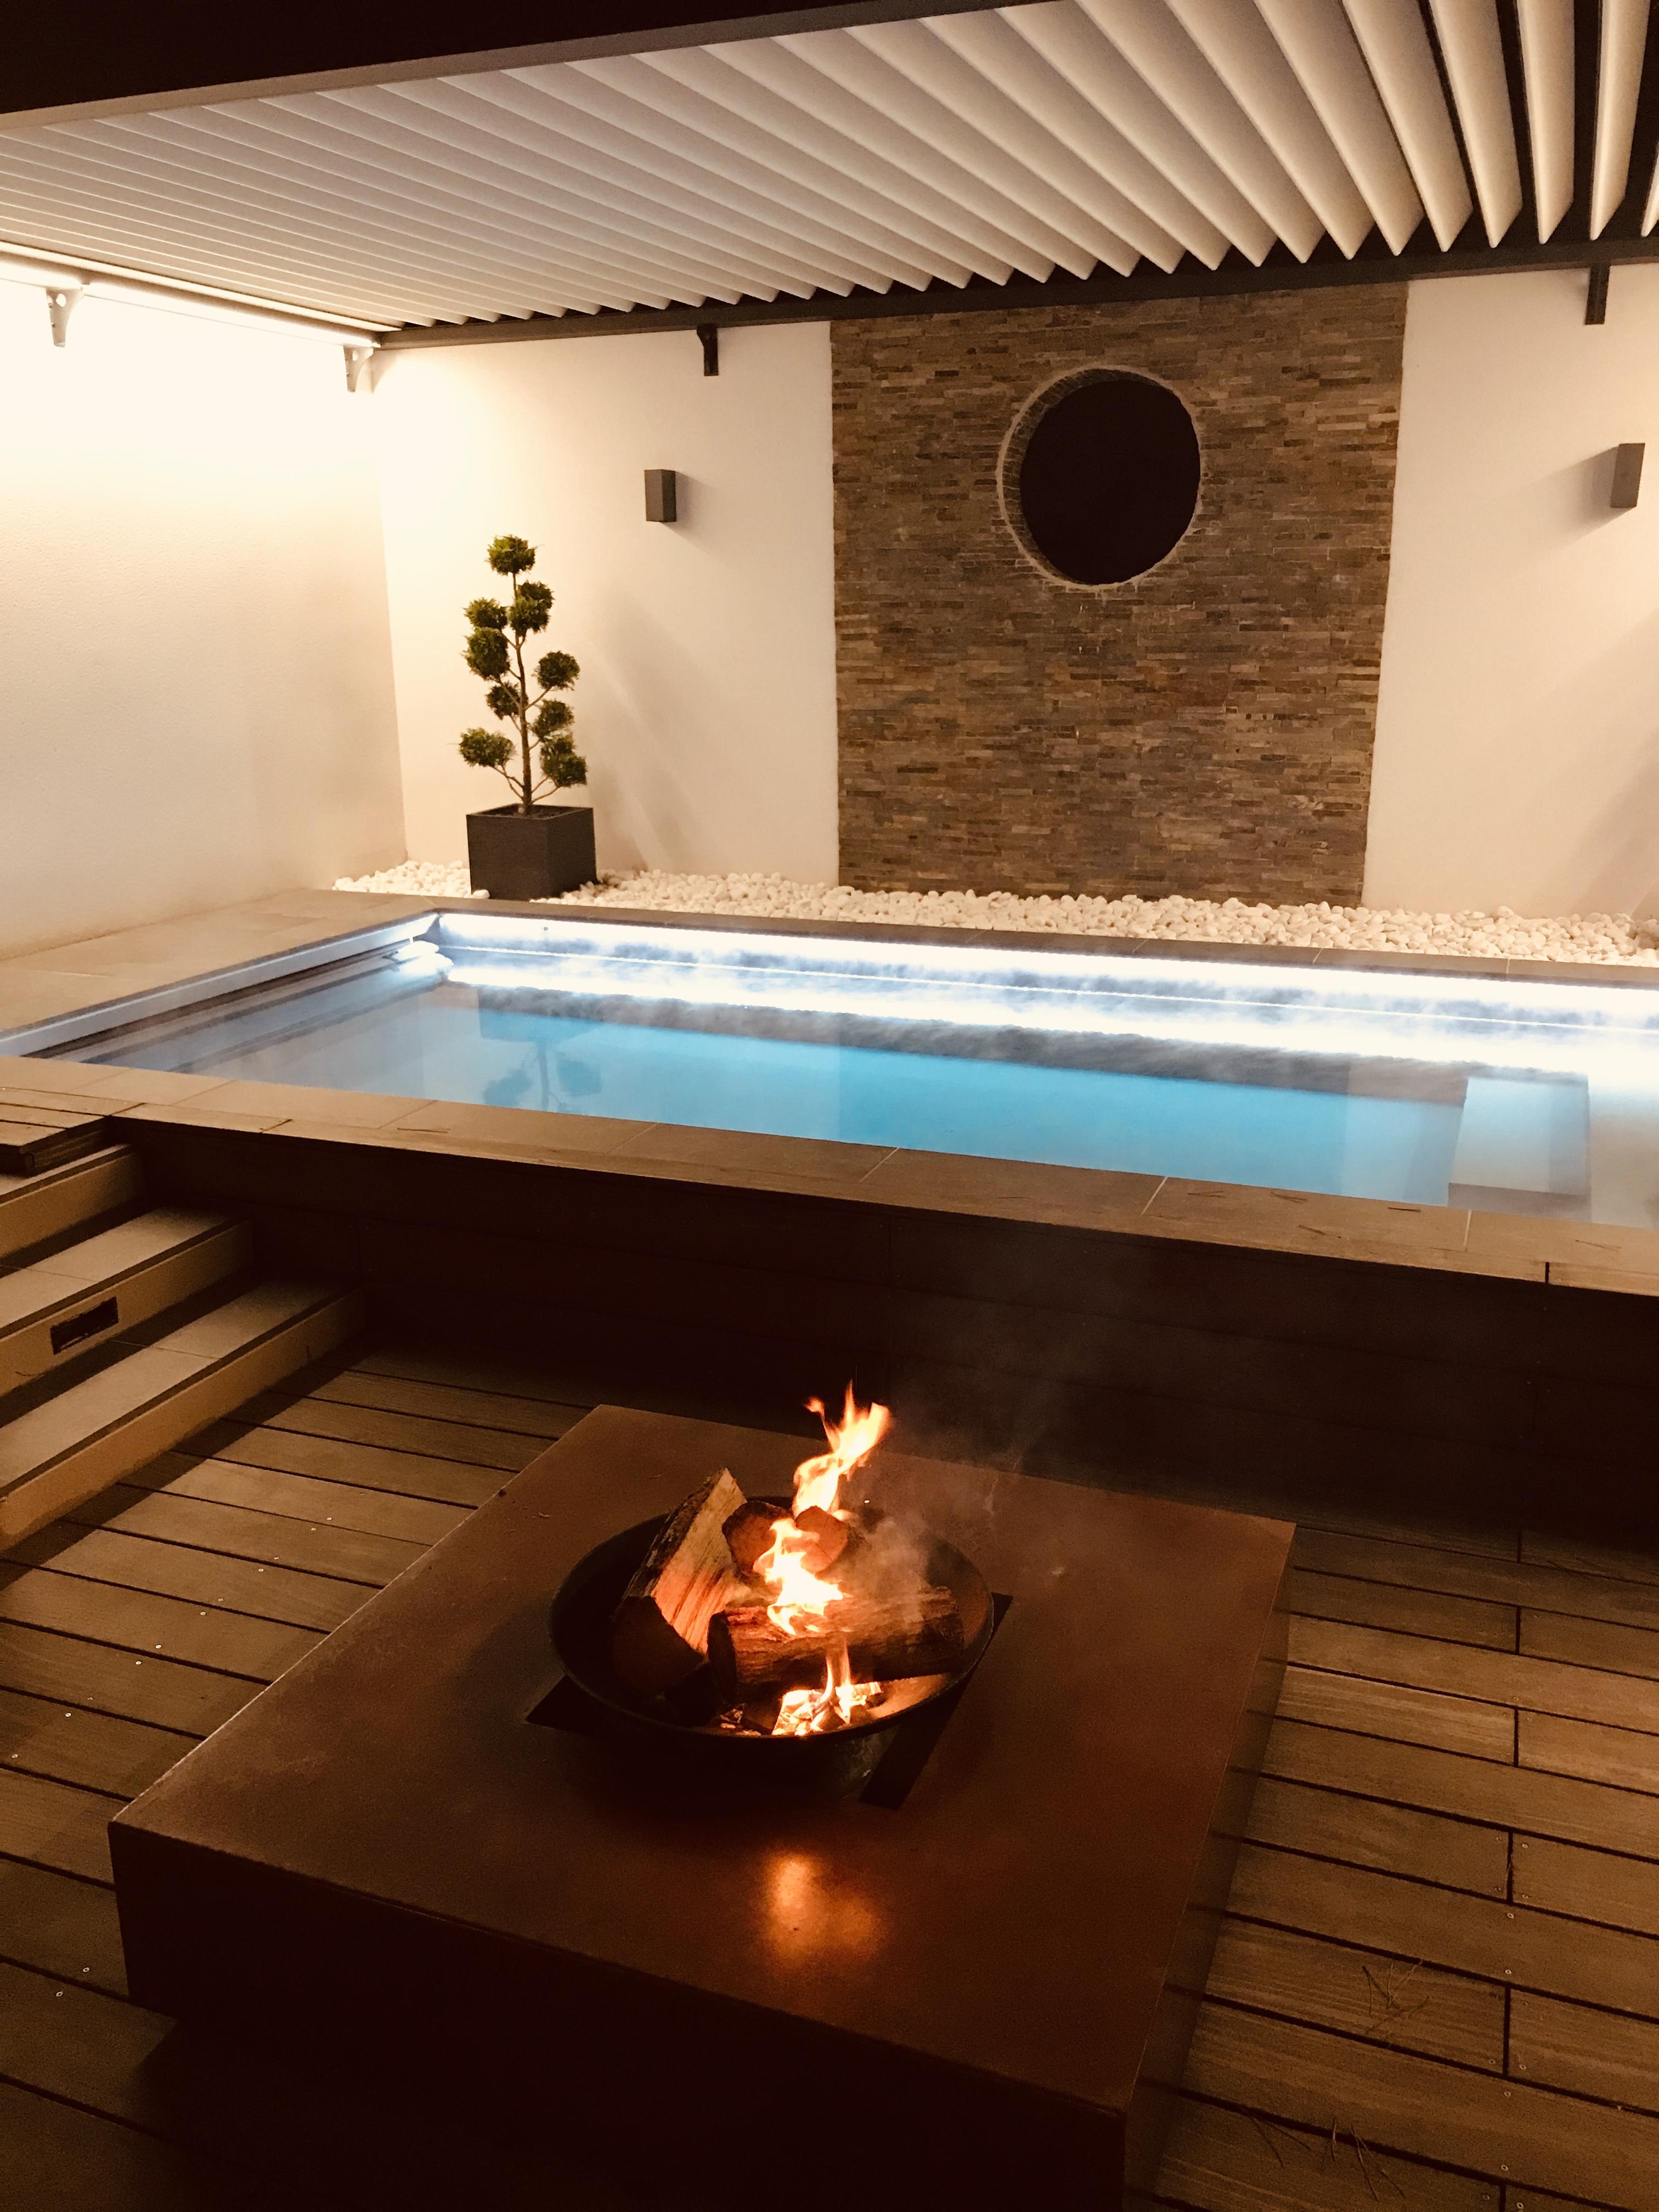 Anandita patio piscine et feu de bois